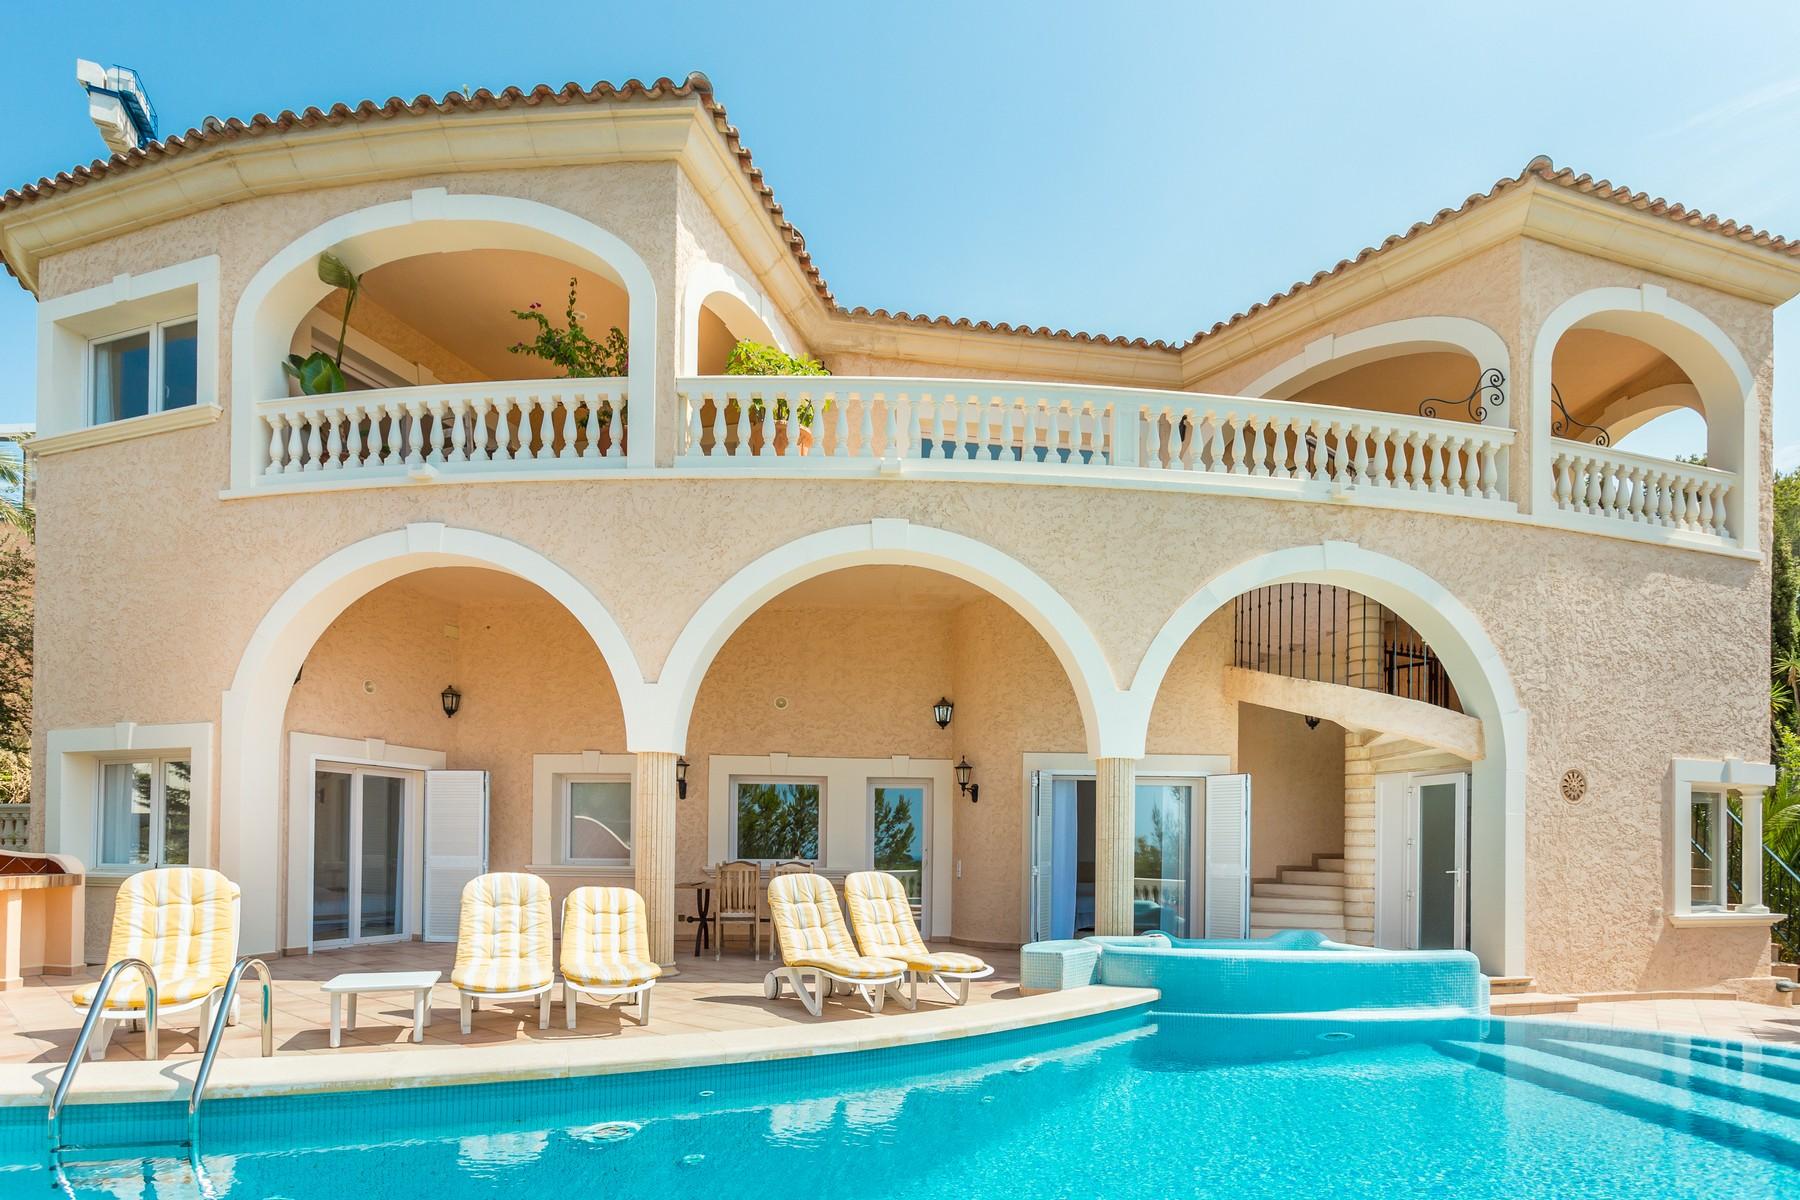 Single Family Home for Sale at Villa with sea views in Bendinat Bendinat, Mallorca 07082 Spain